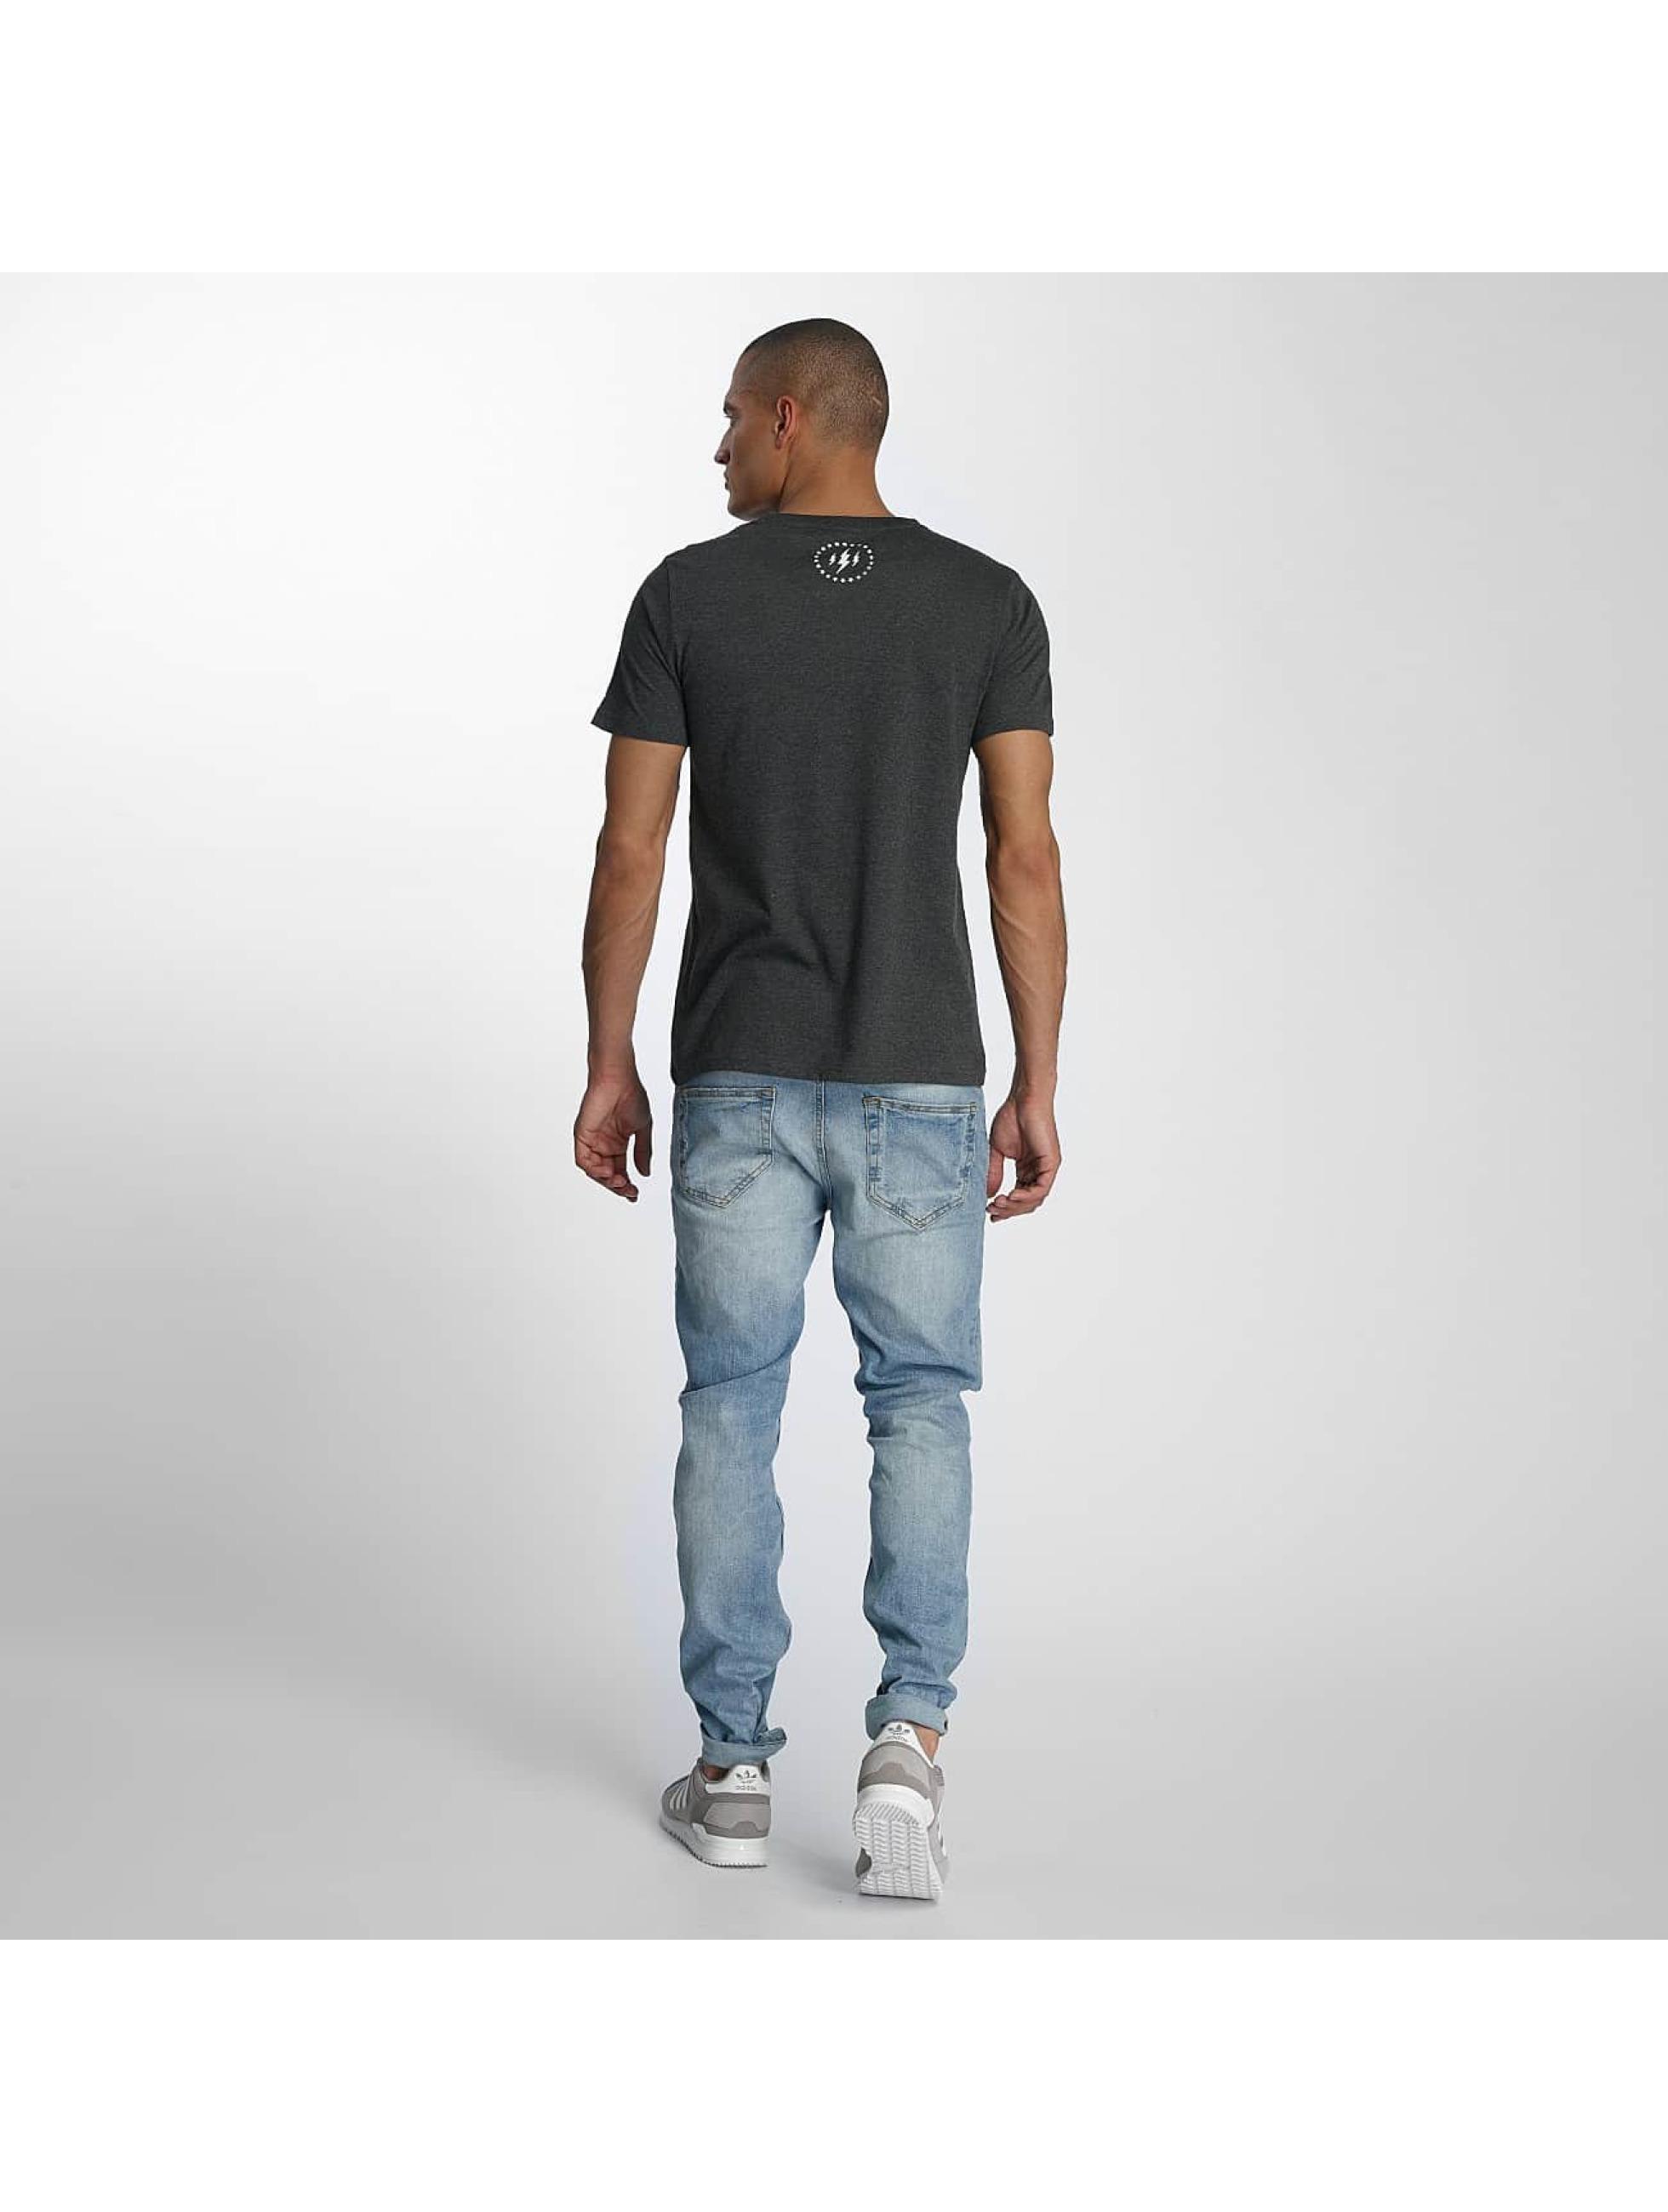 TrueSpin T-Shirt 8 grau